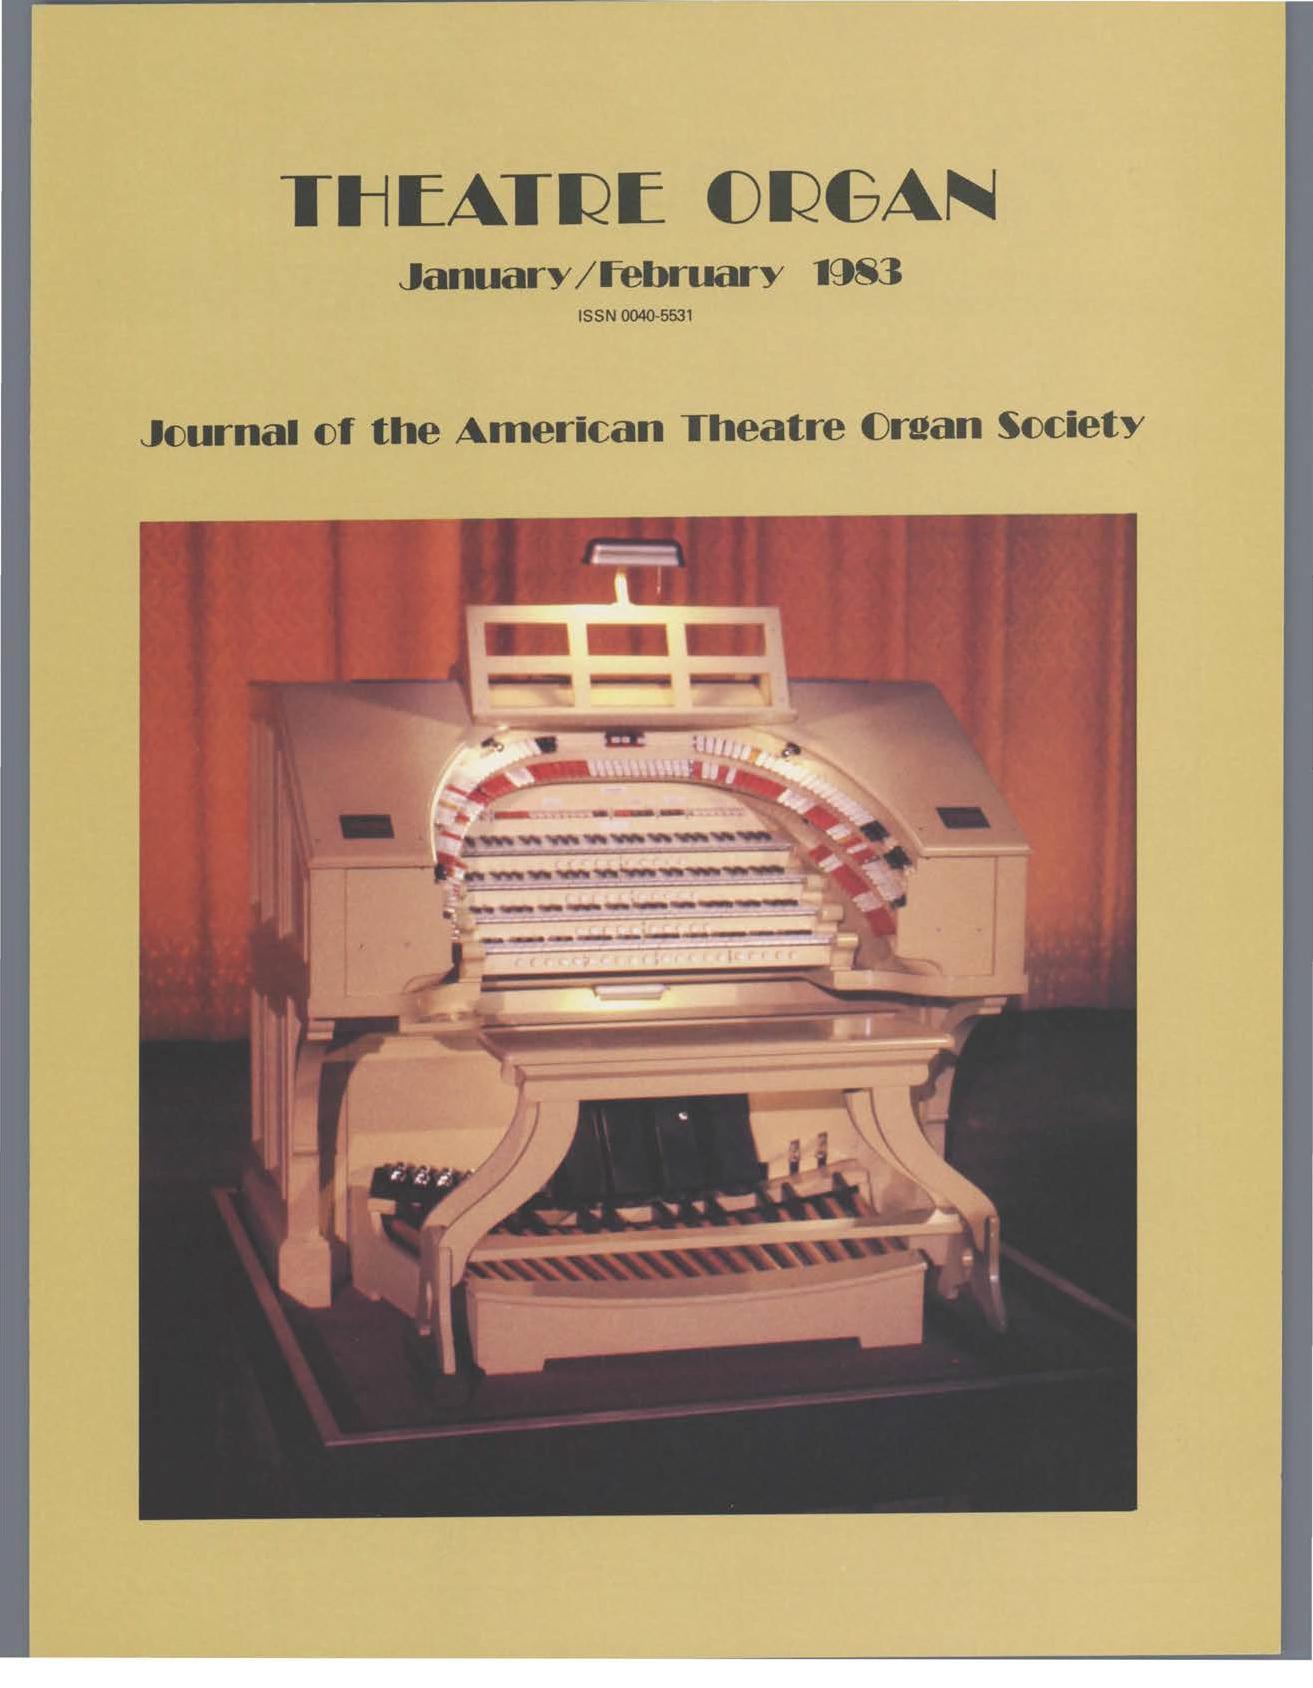 Theatre Organ, January - February 1983, Volume 25, Number 1